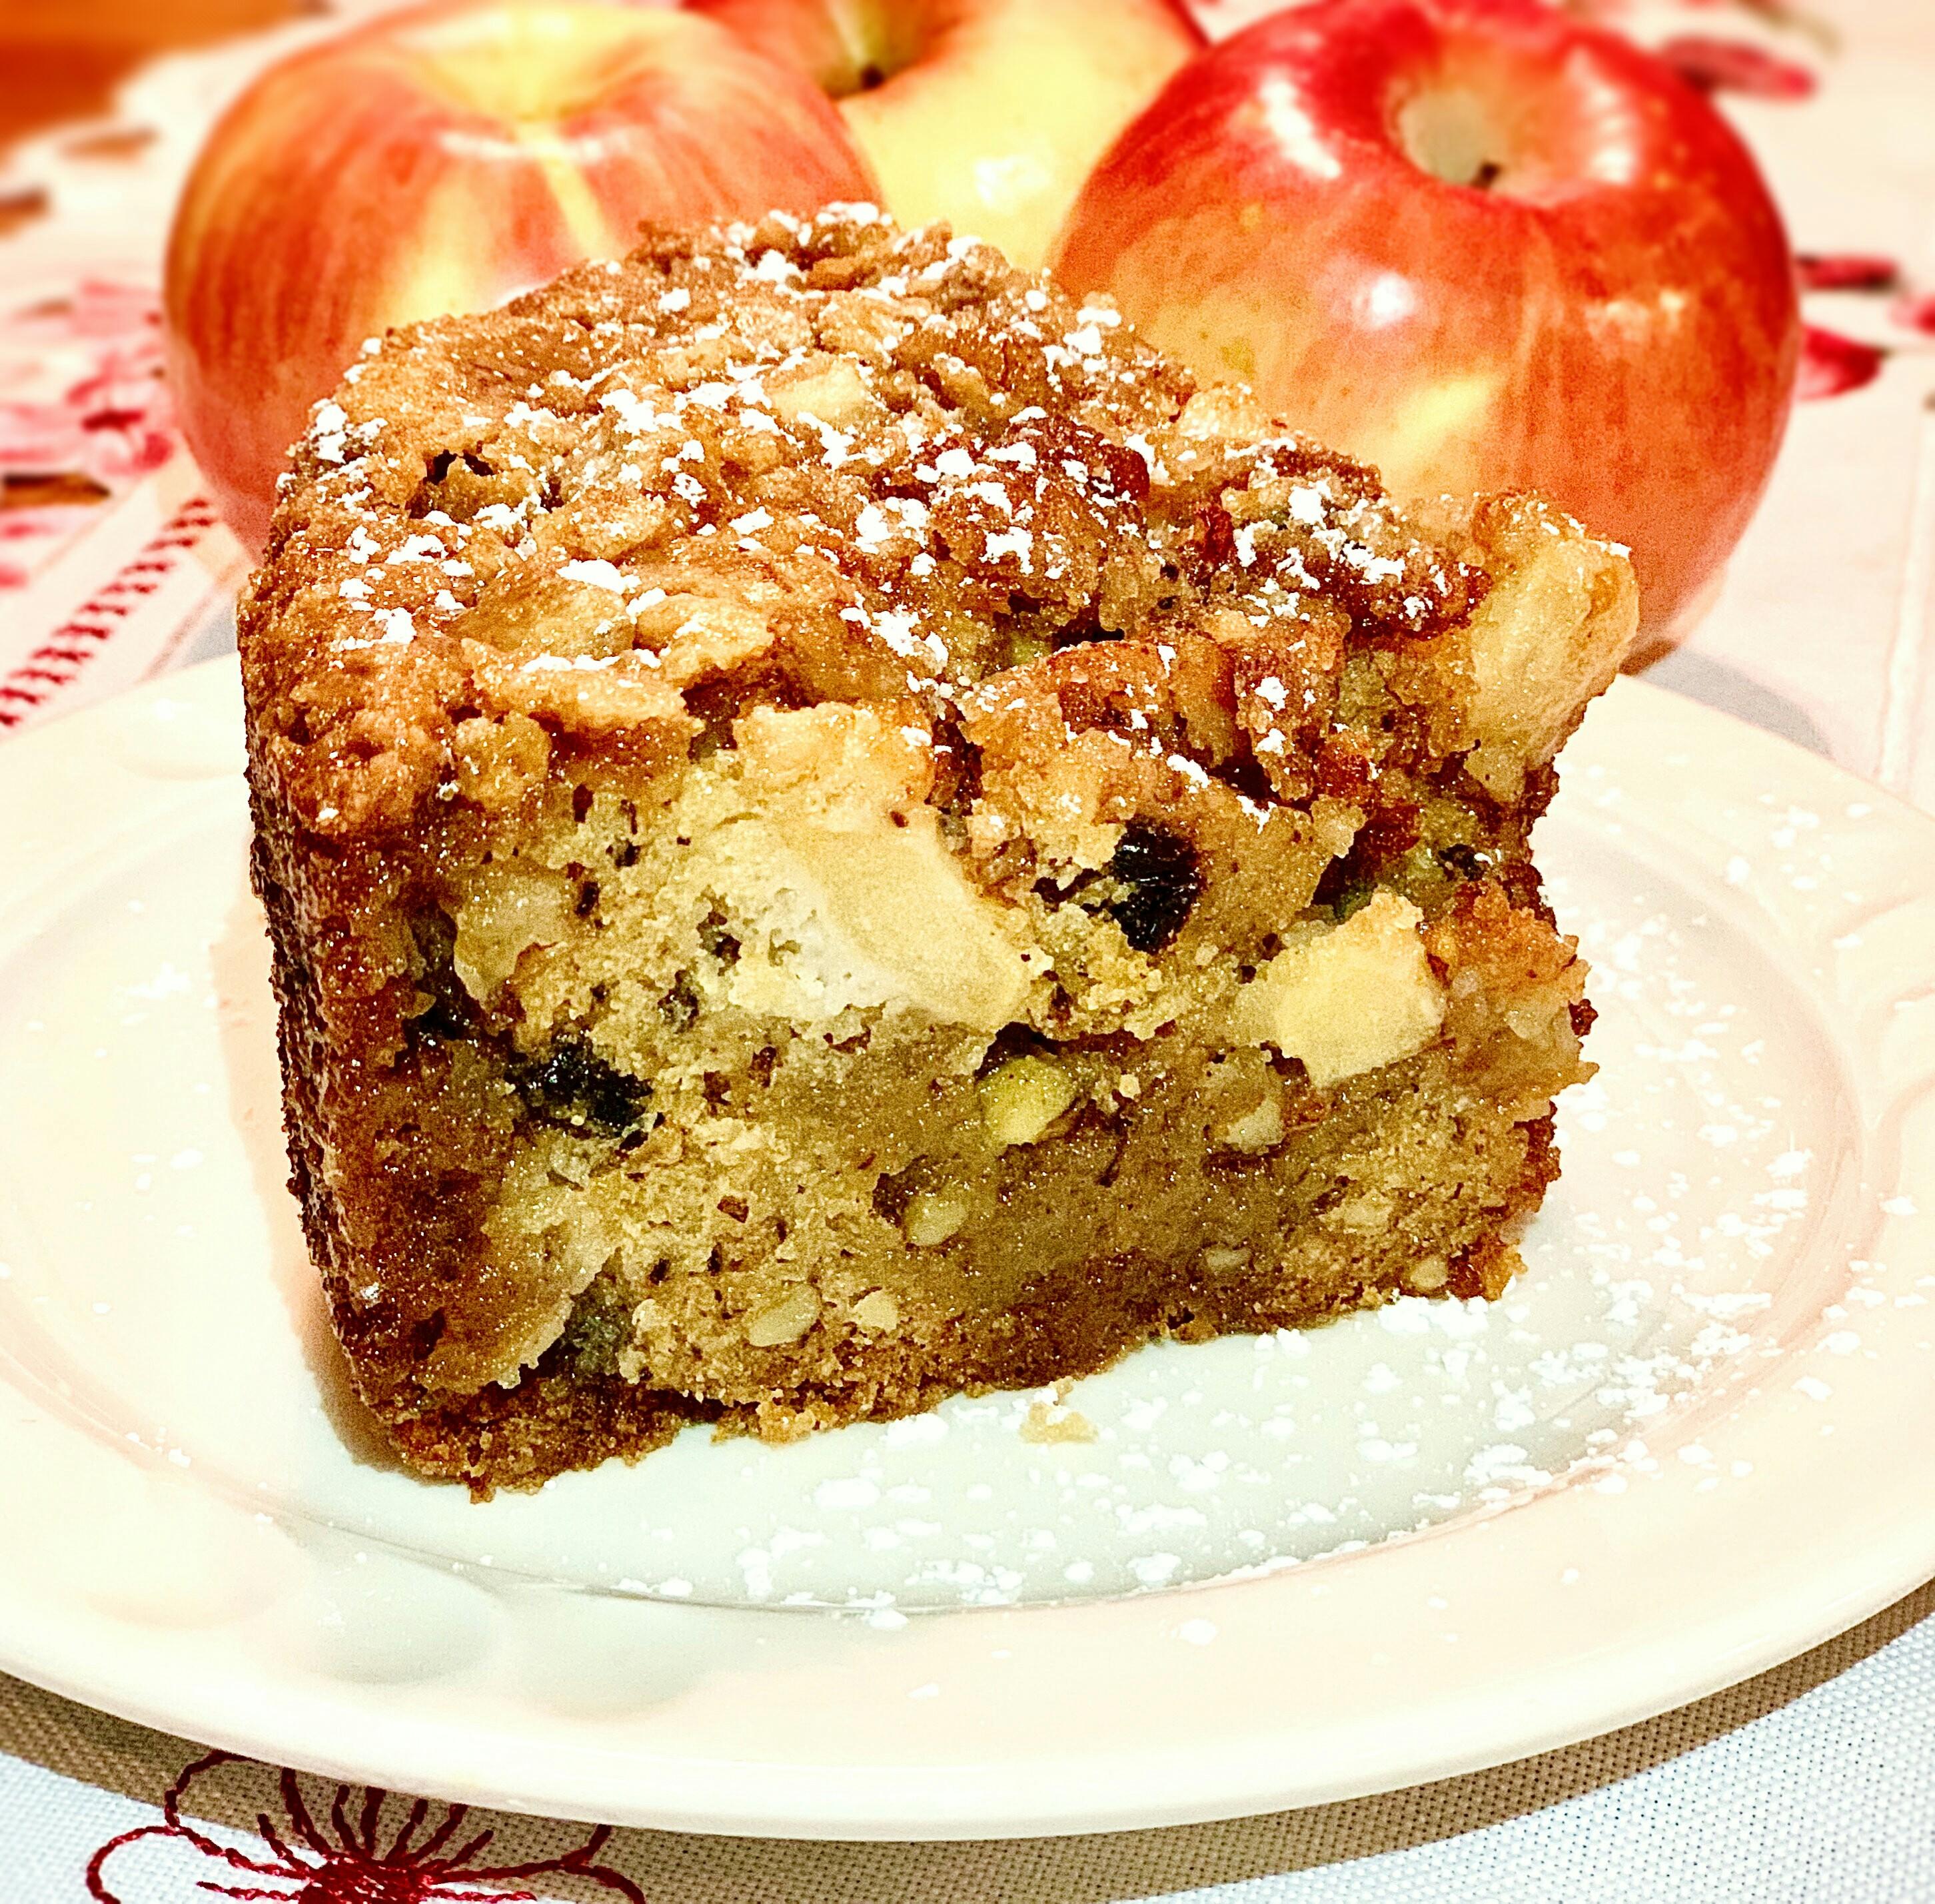 Cranberry-Apple Cake with Salted Caramel Glaze